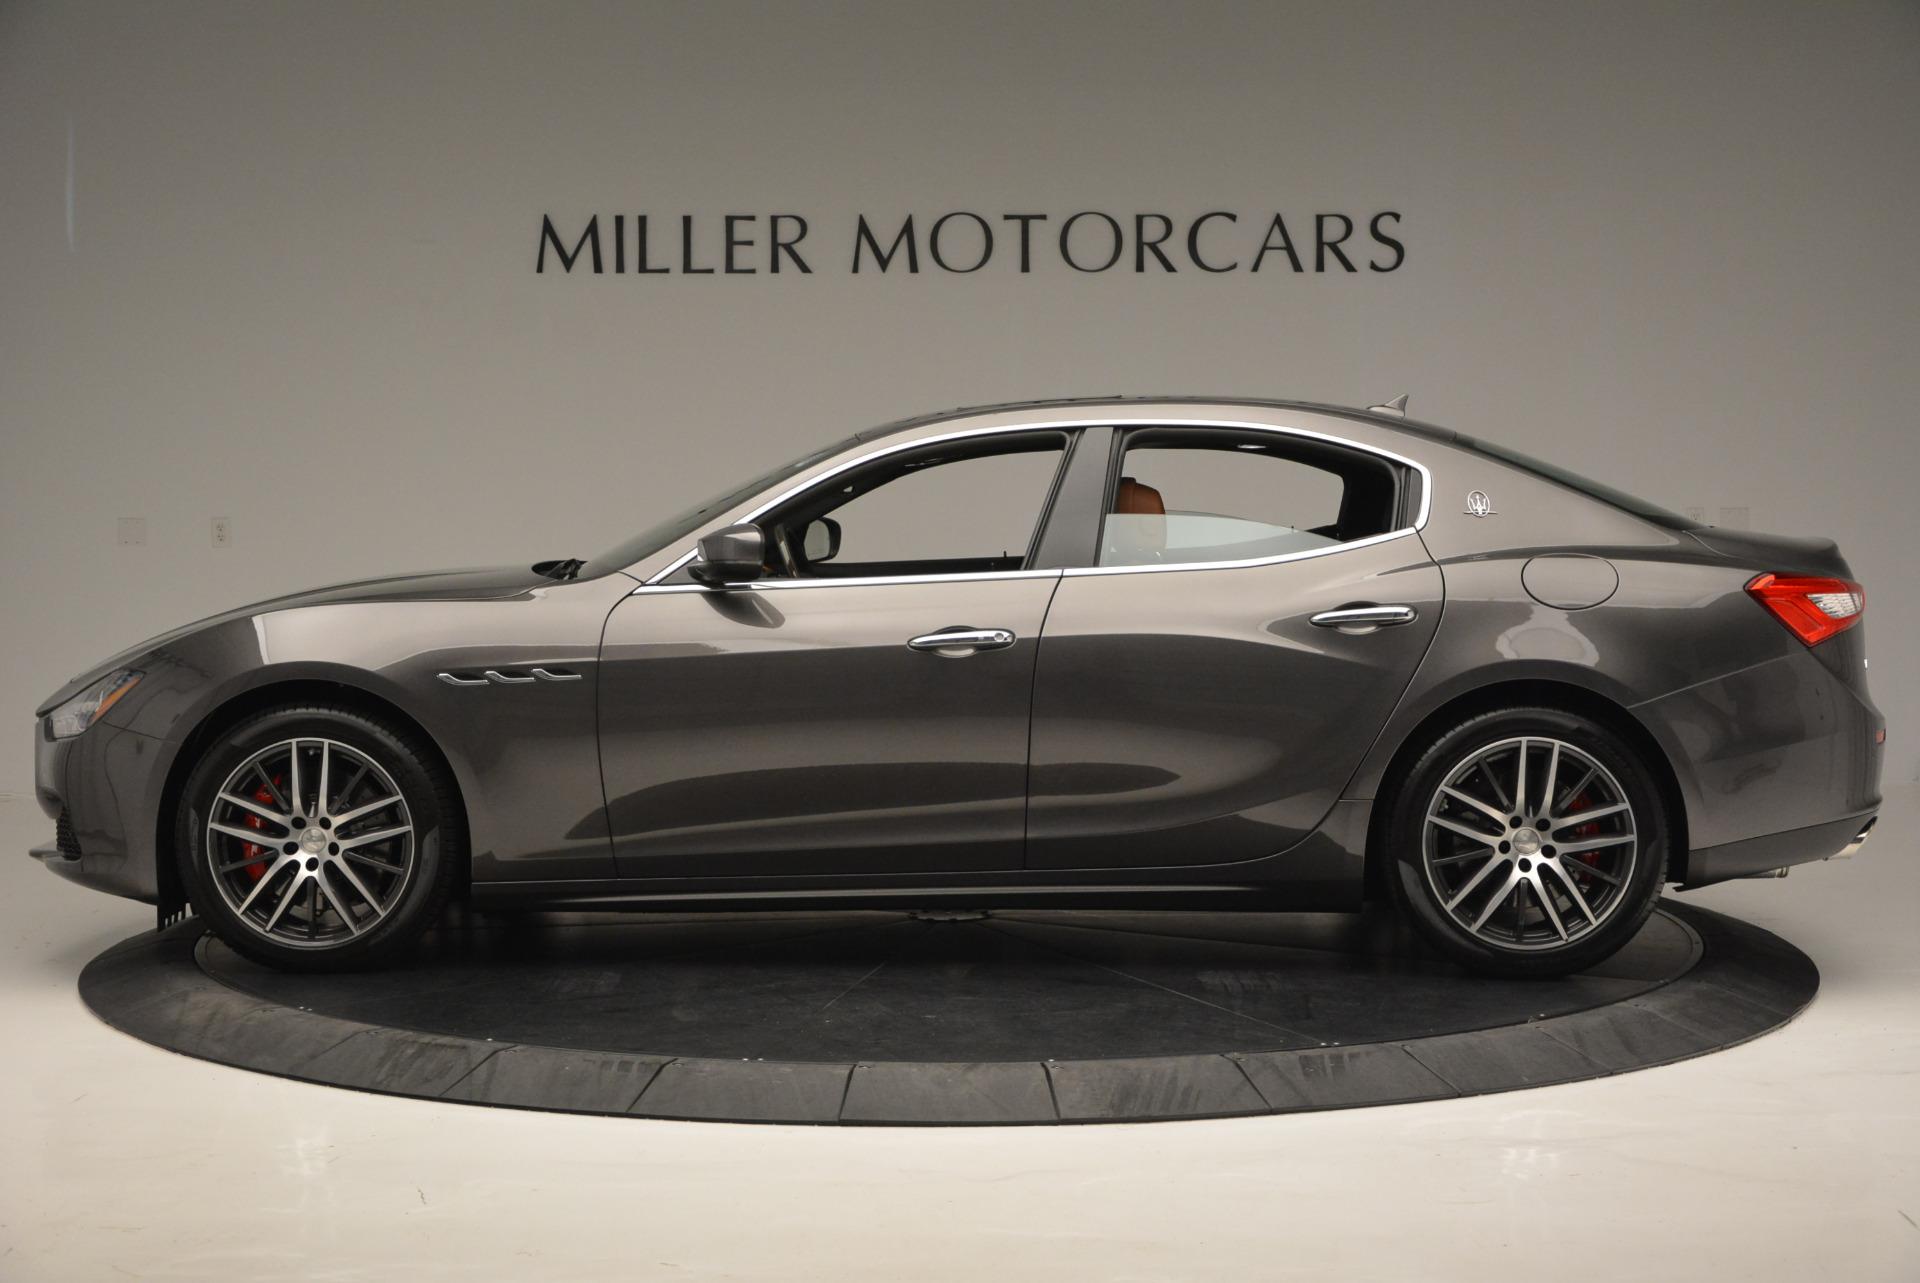 Used 2017 Maserati Ghibli S Q4  EX-LOANER For Sale In Greenwich, CT. Alfa Romeo of Greenwich, W311 565_p3